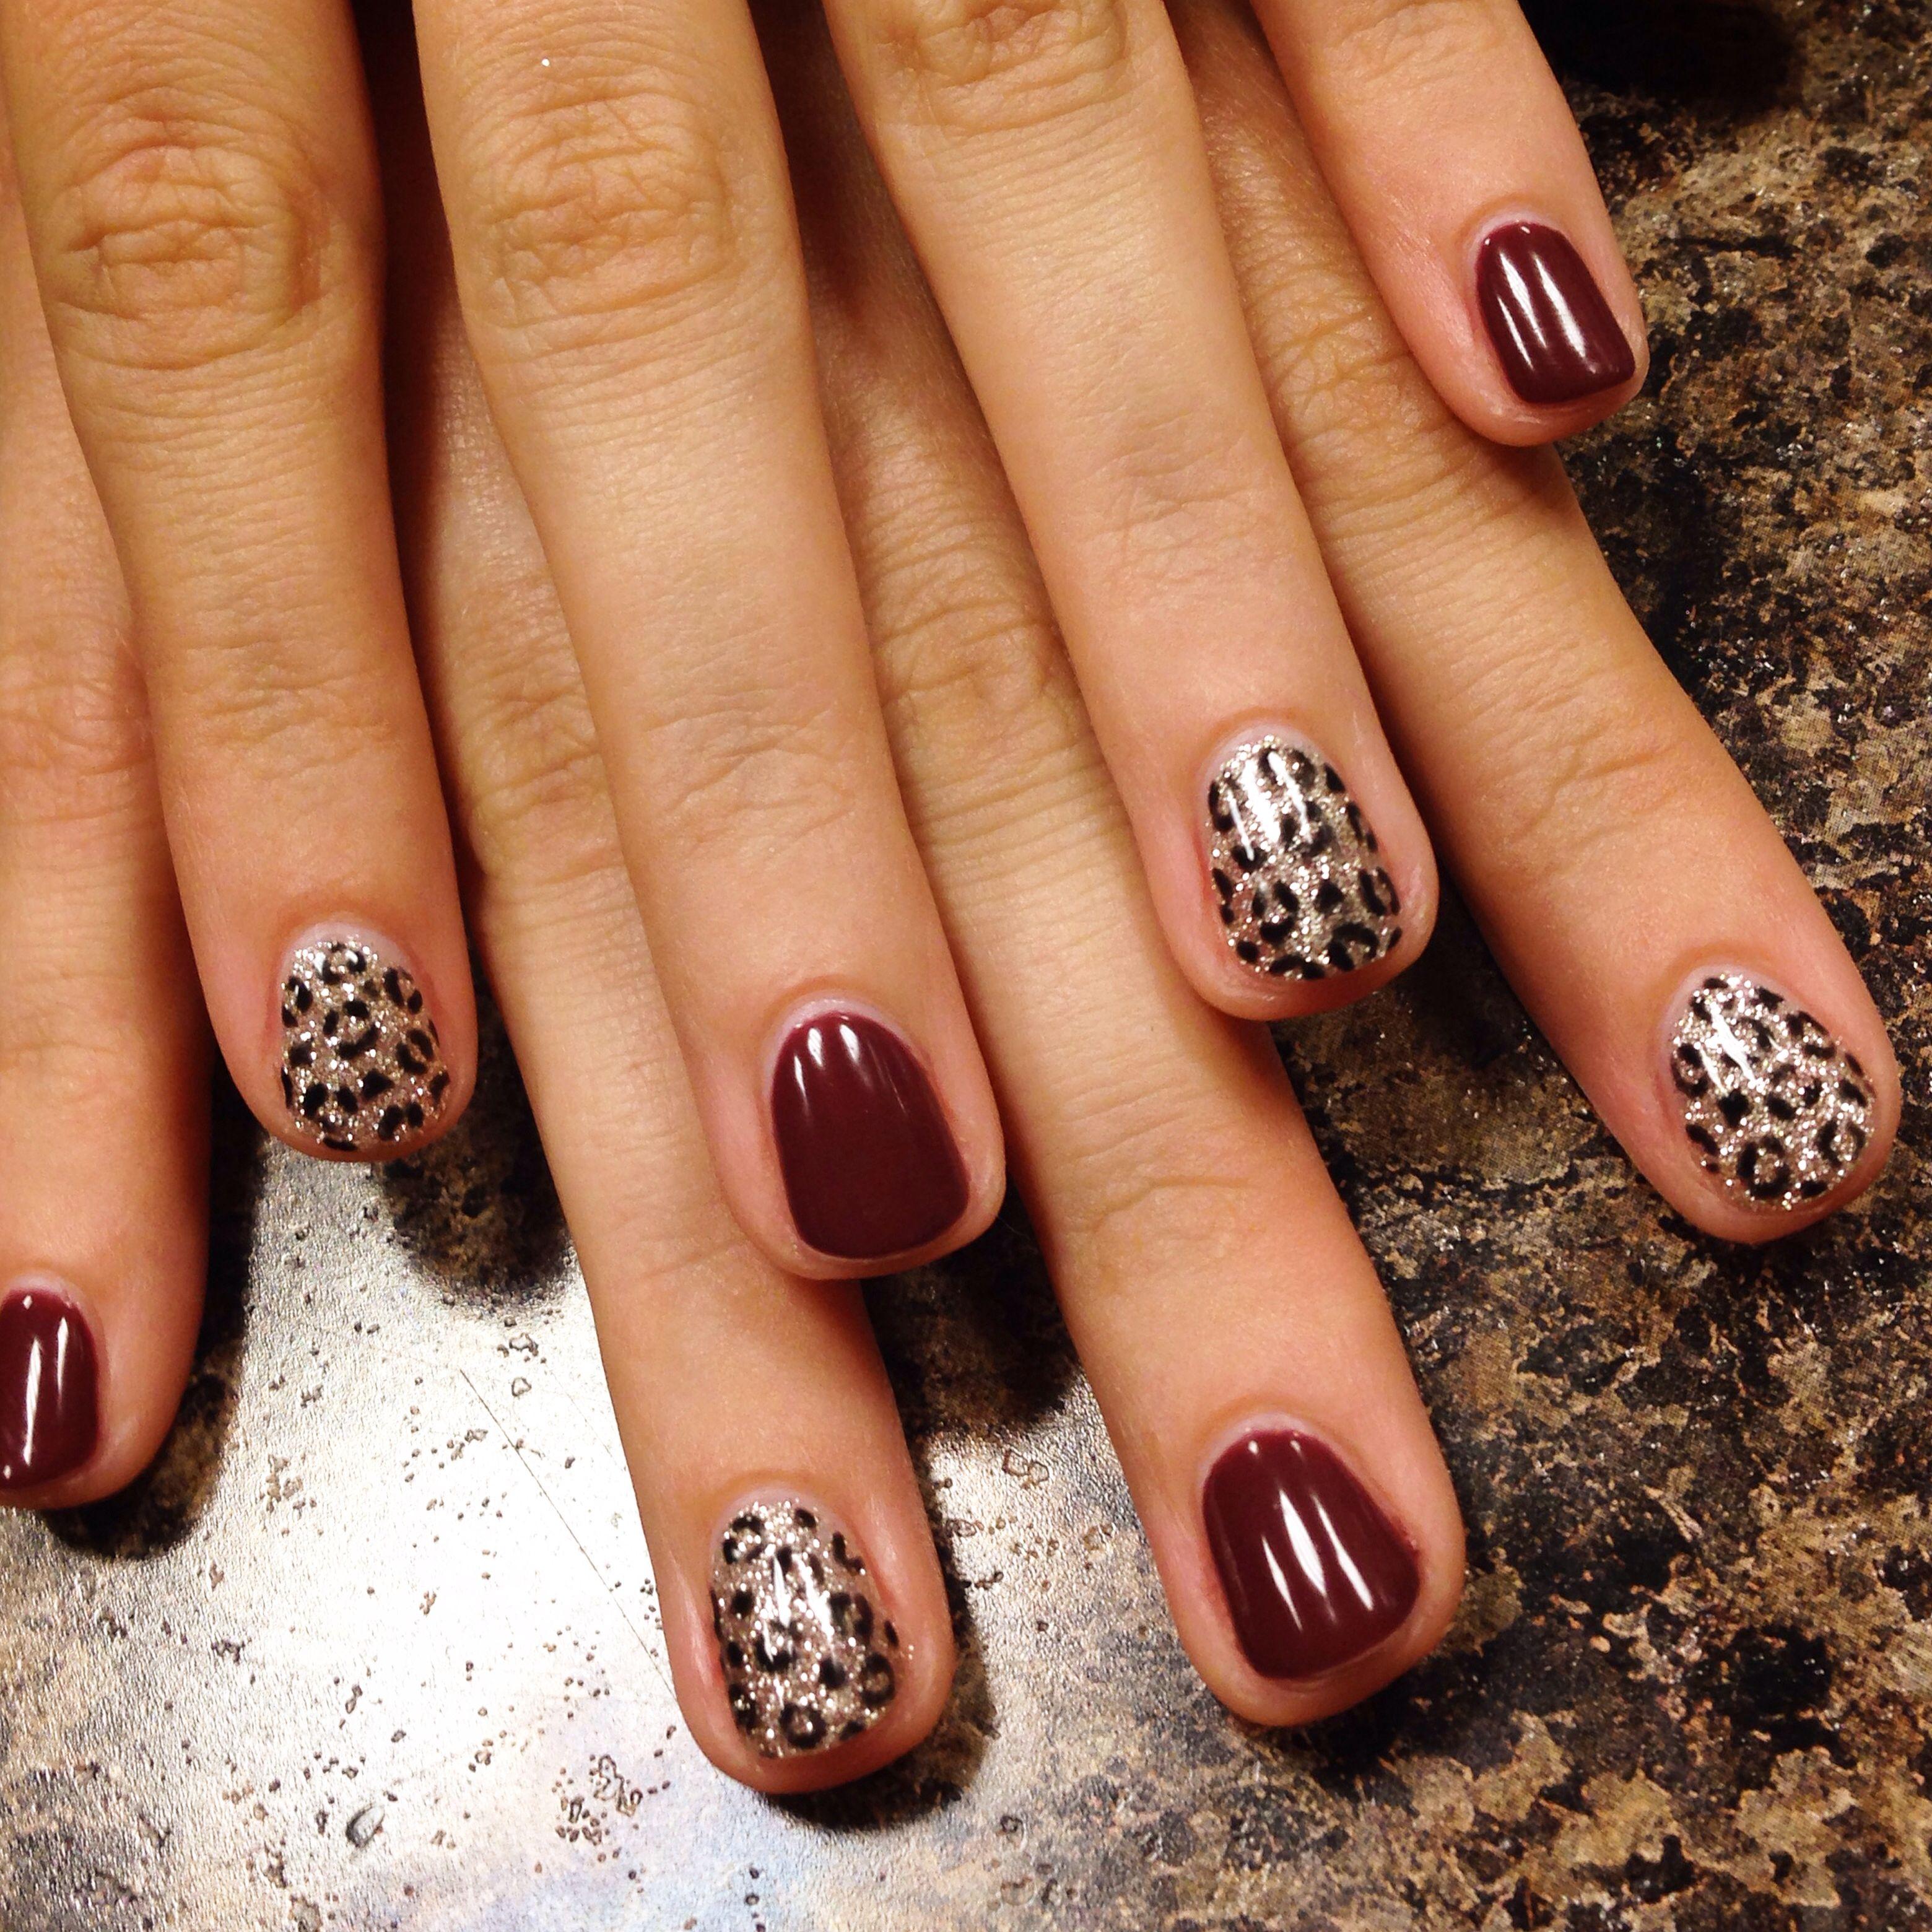 glitter cheetah print and burgundy gel nails nail art pinterest n gel. Black Bedroom Furniture Sets. Home Design Ideas